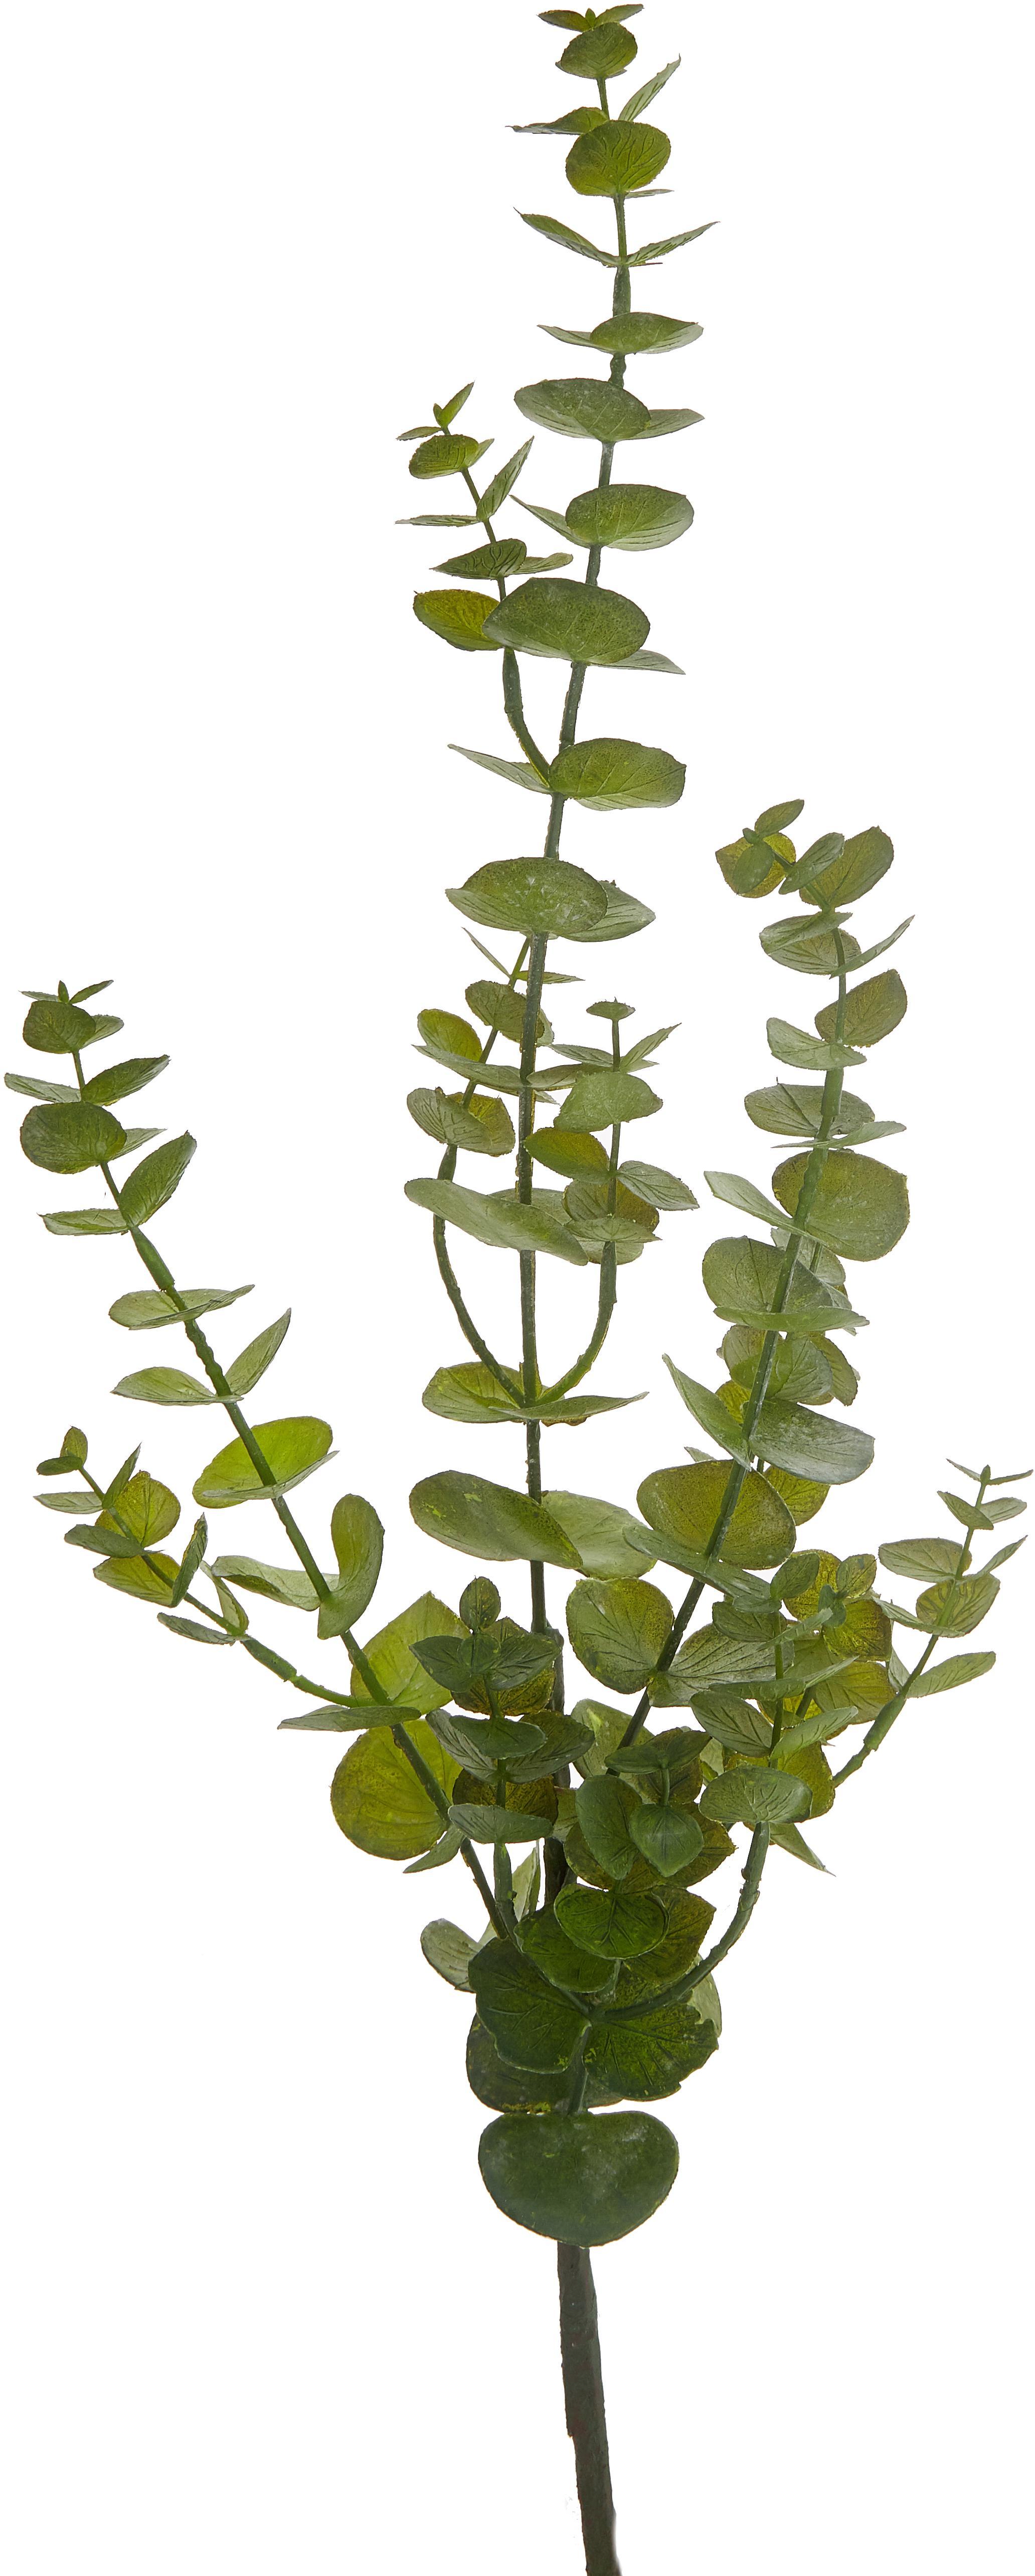 Fiore artificiale Eukalyptus, Materiale sintetico, metallo, Verde, Larg. 20 x Lung. 81 cm